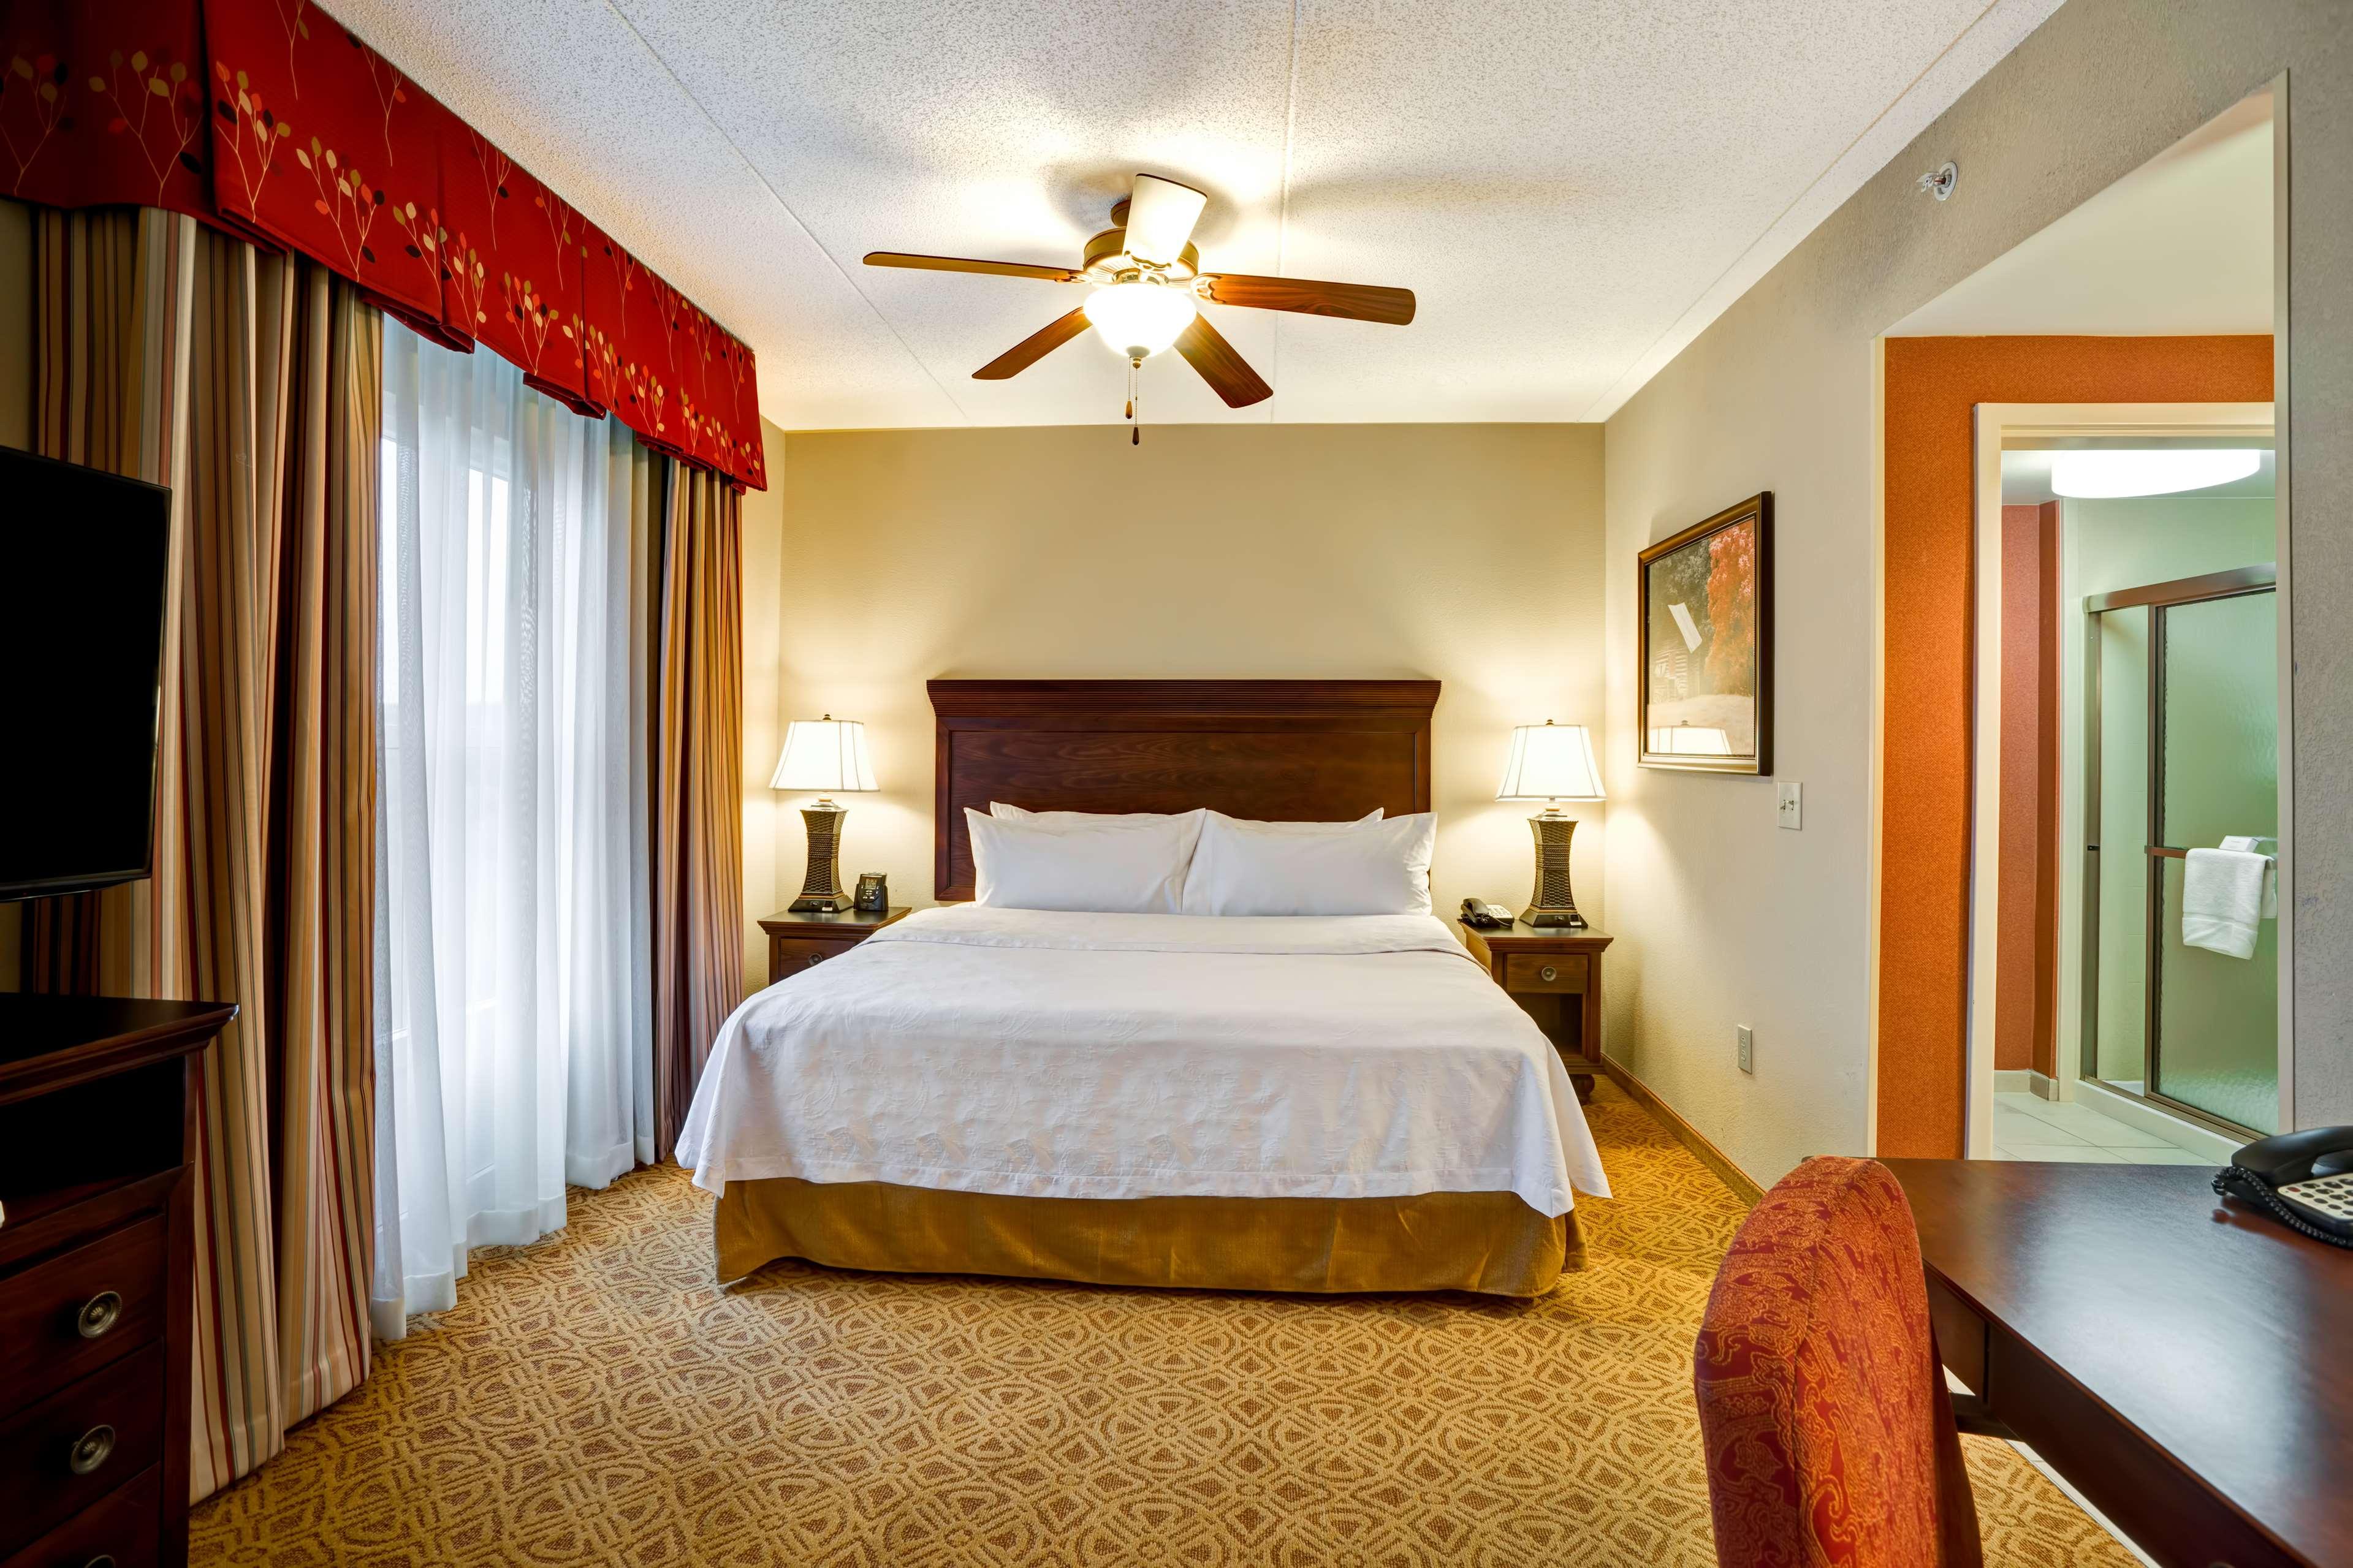 Homewood Suites by Hilton Fredericksburg image 25